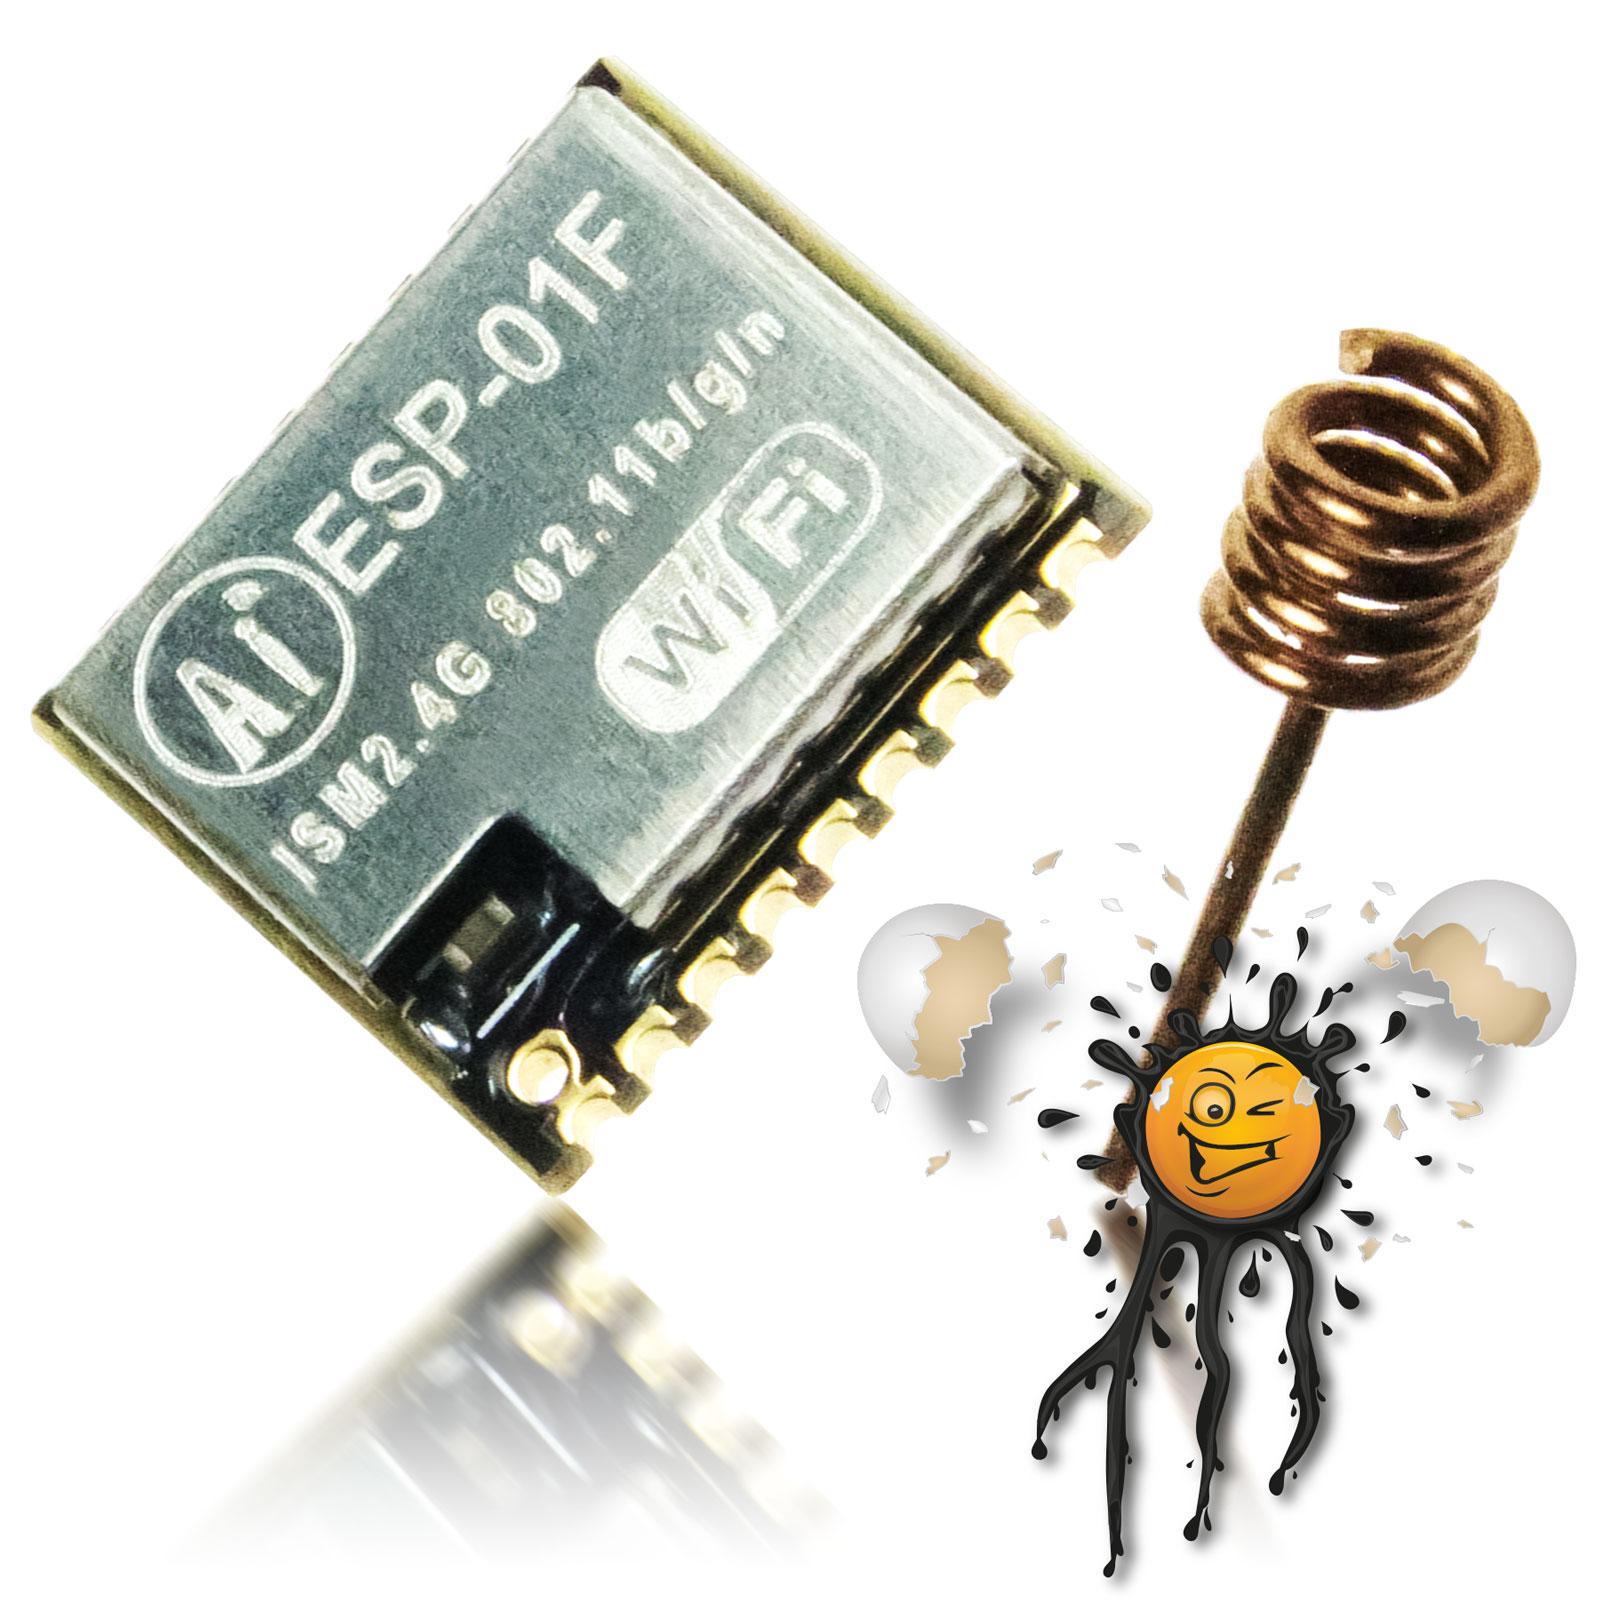 ESP-01F ESP8285 Modul inkl. Antenne